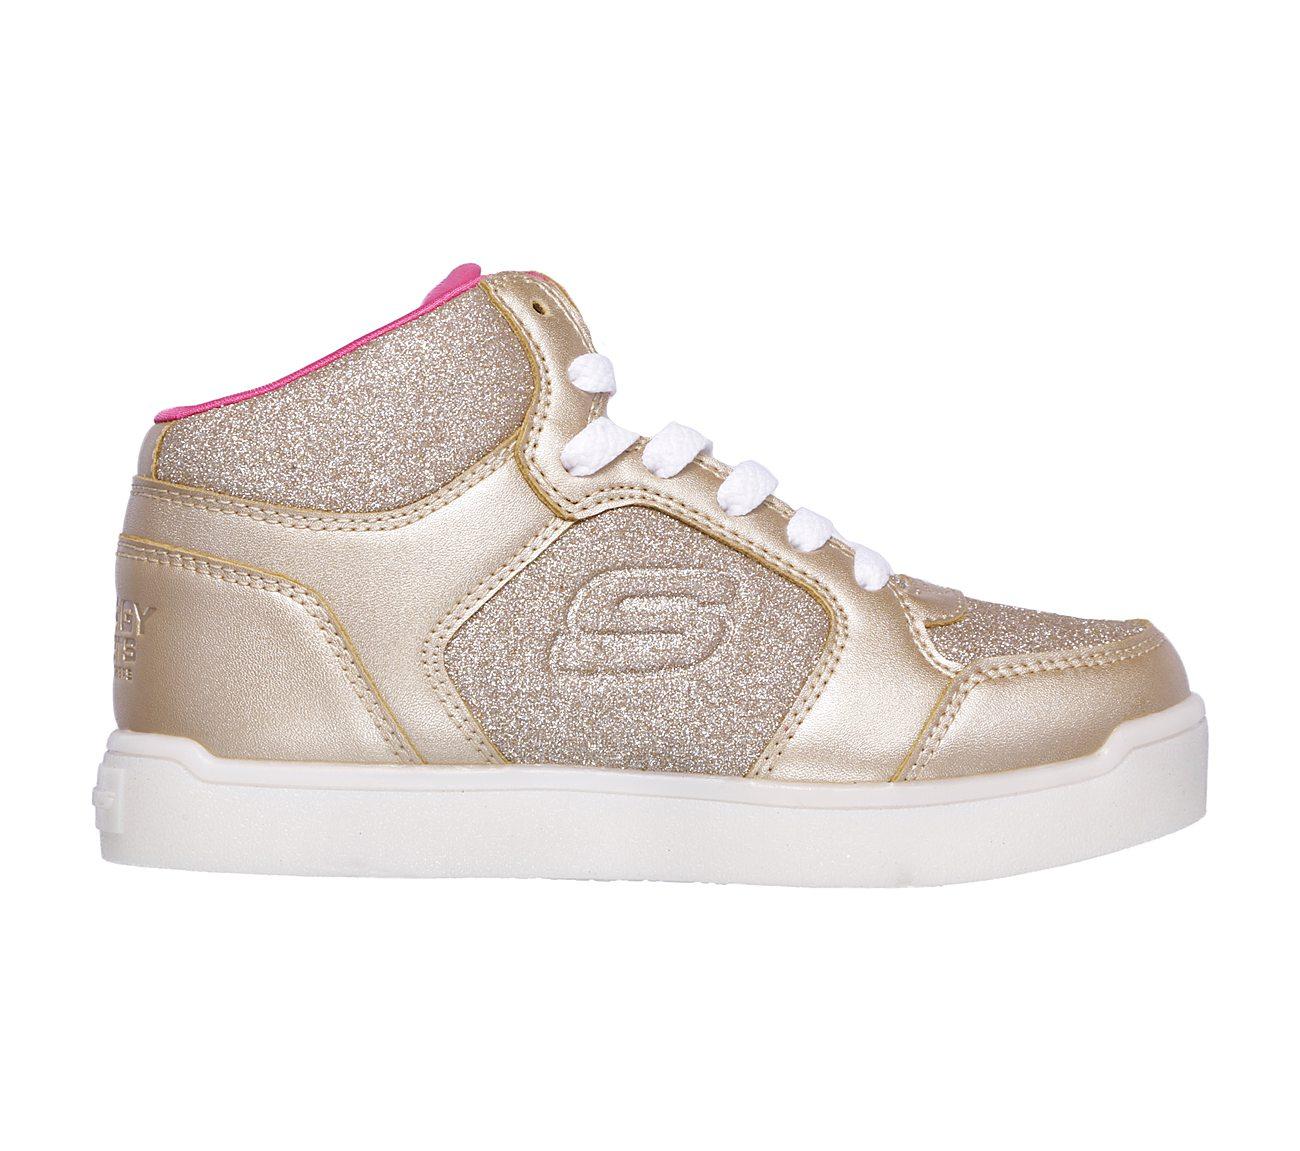 9b5c12a3b3 Παπούτσια Skechers.